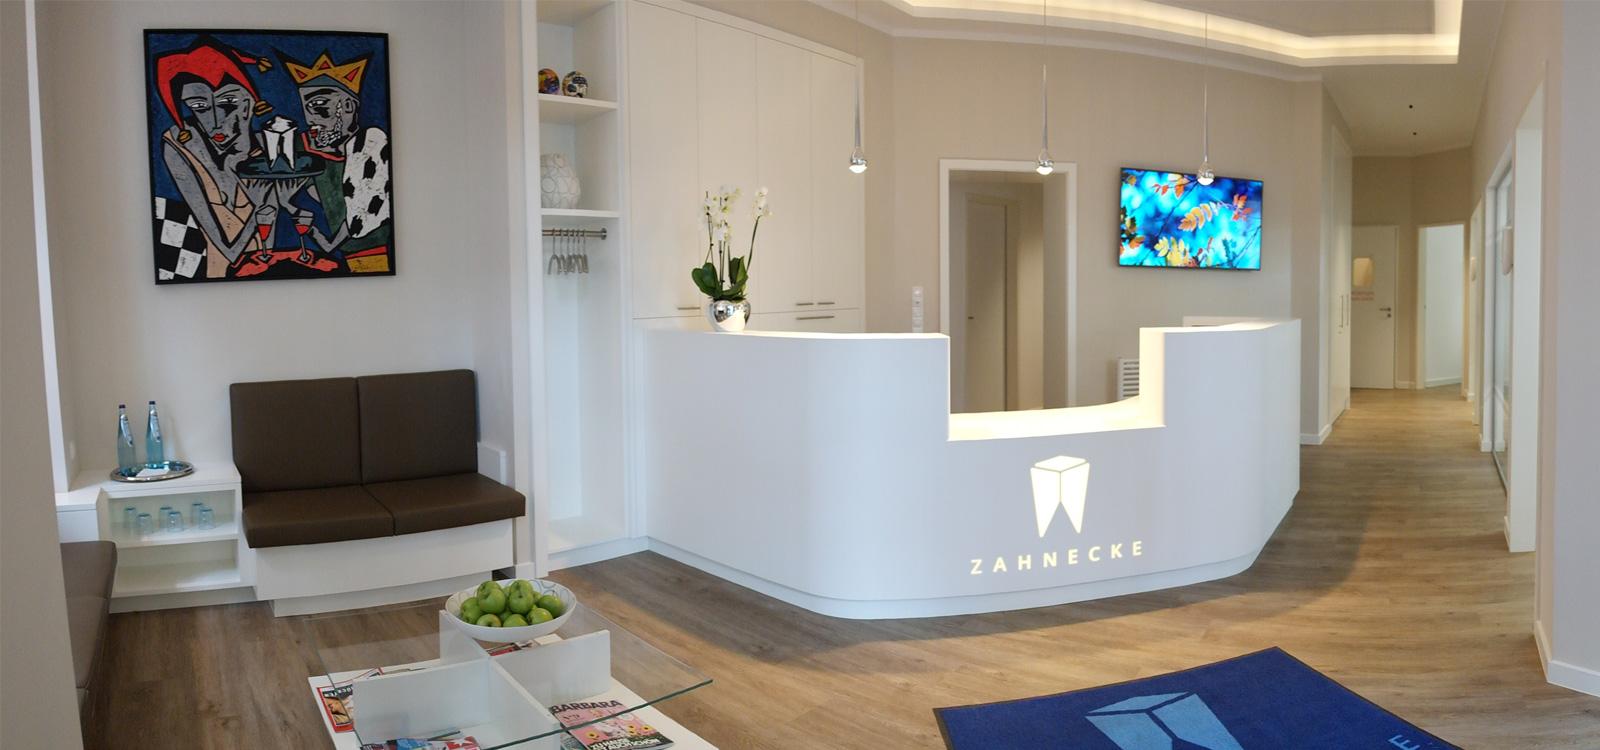 Zahnecke Berlin - Burkhard Riediger Zahnarzt und Partner